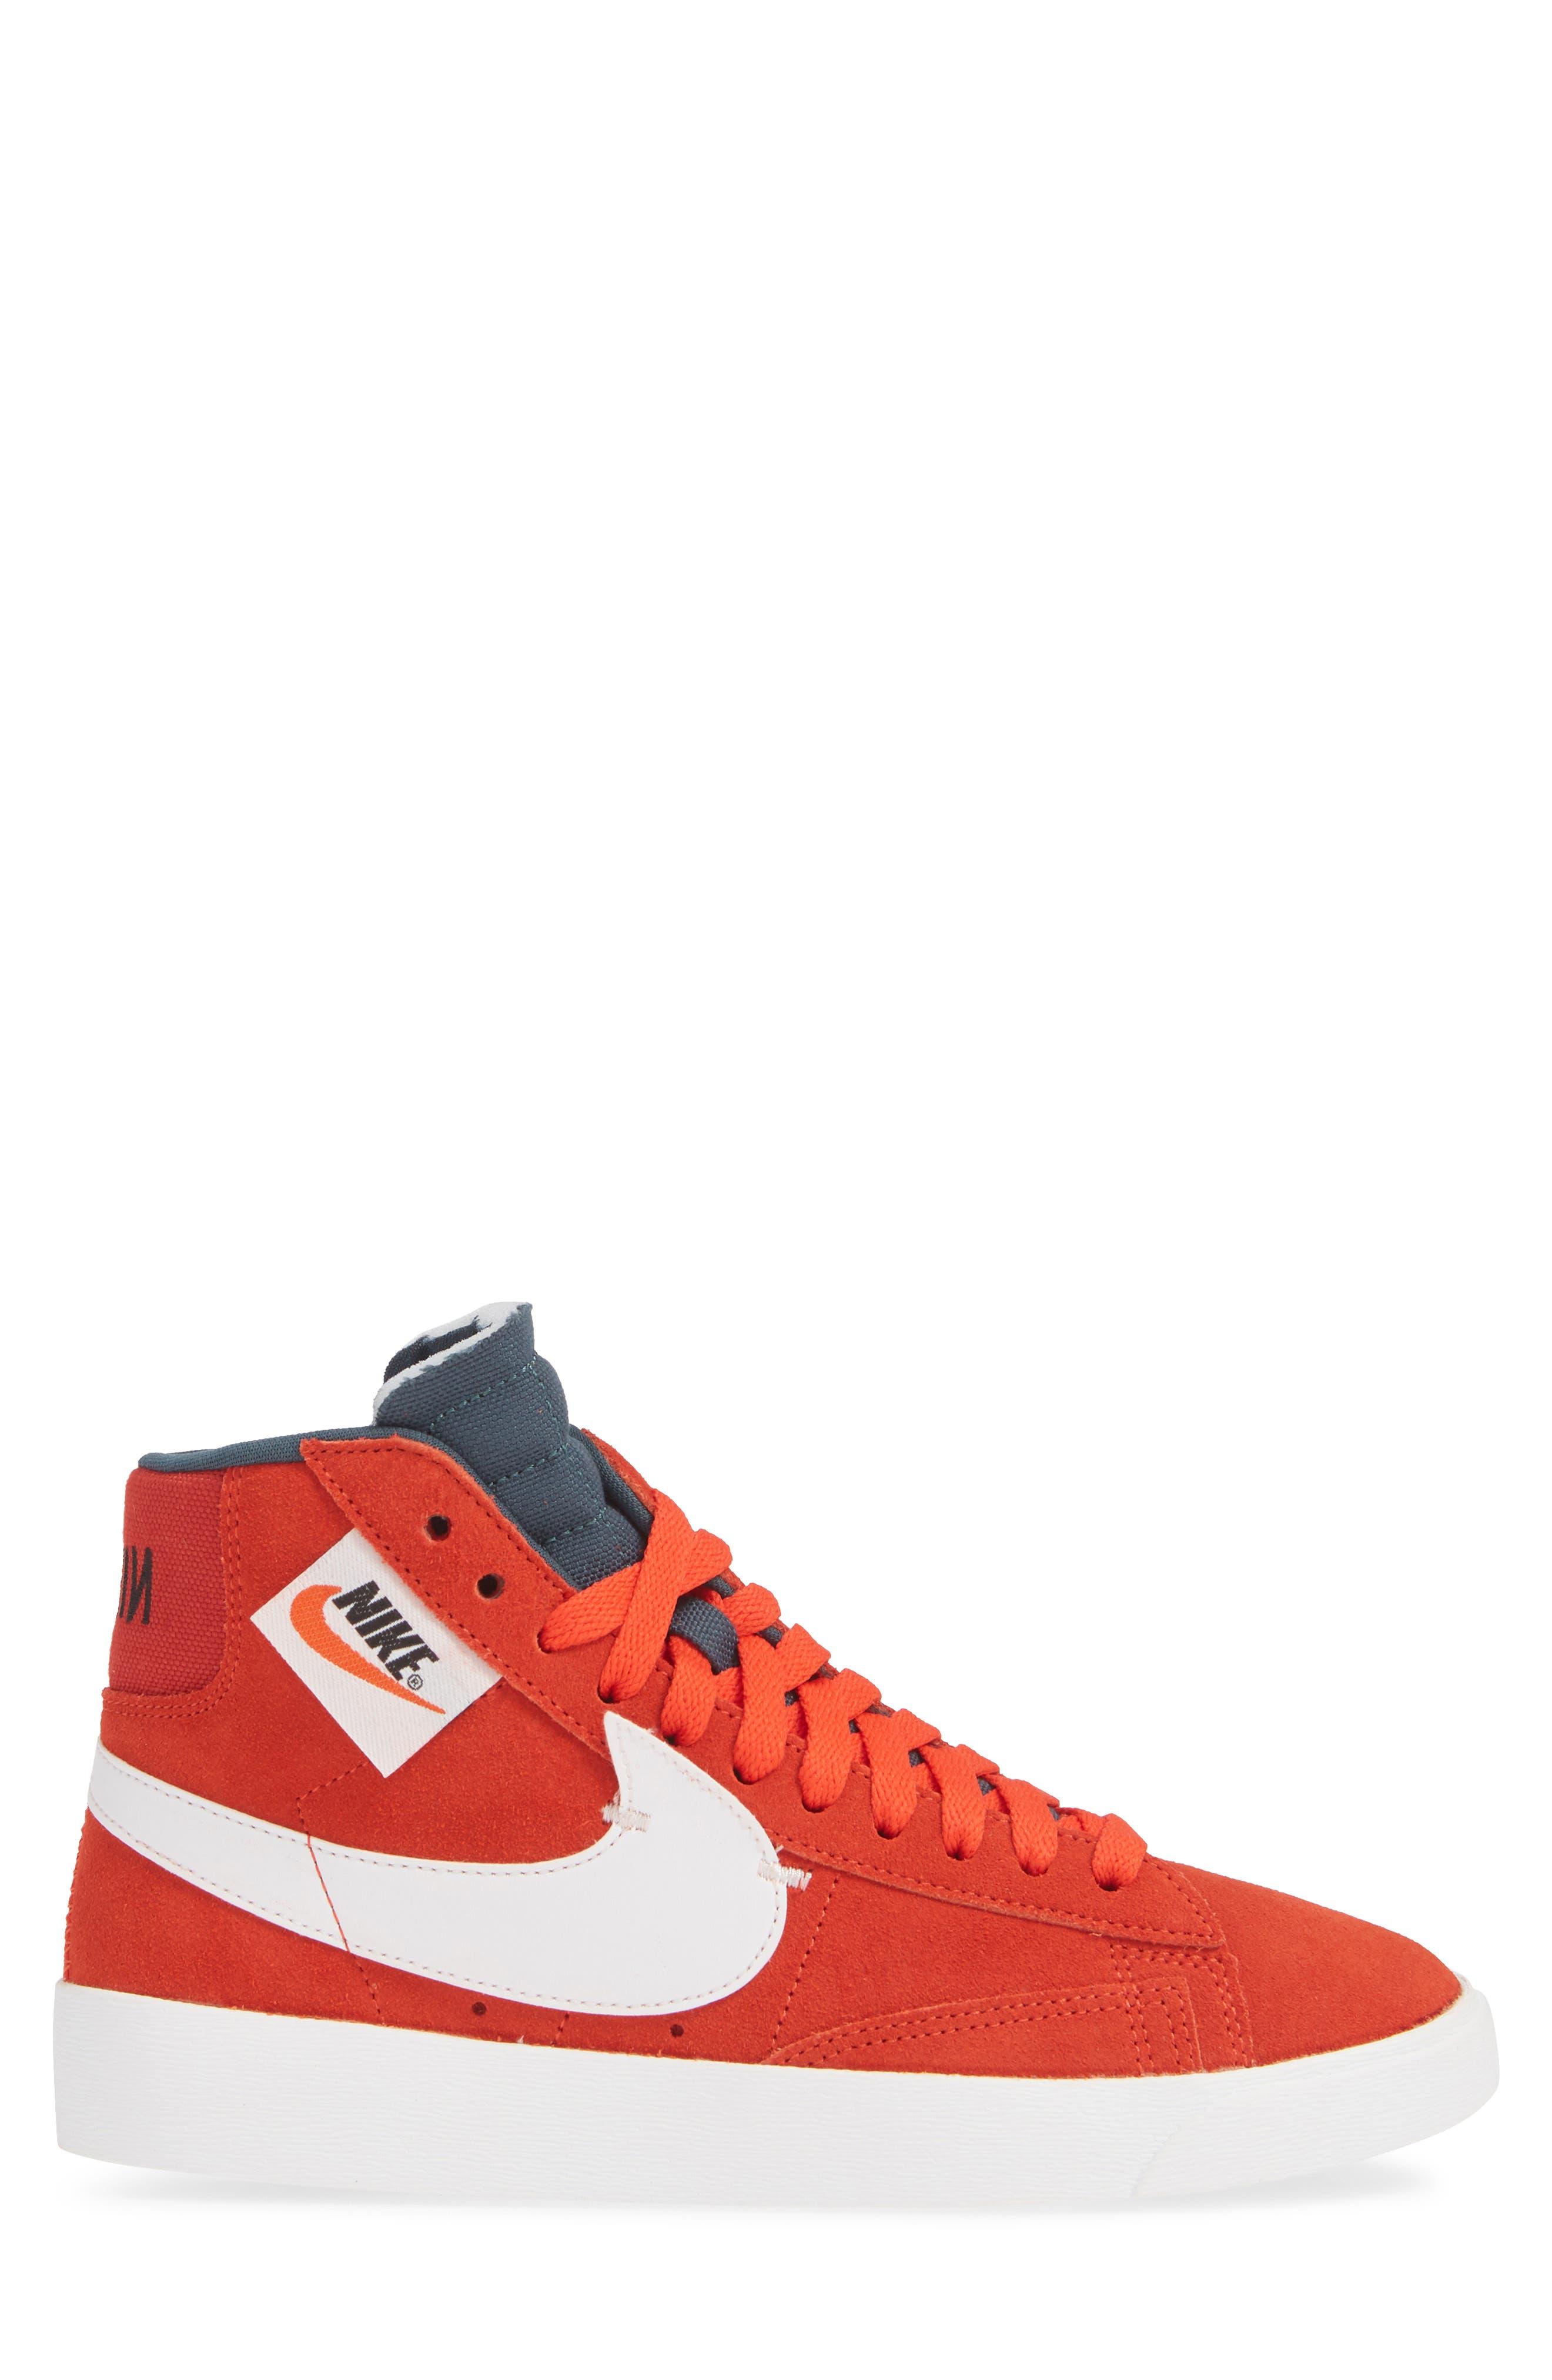 NIKE, Blazer Mid Rebel Sneaker, Alternate thumbnail 3, color, 601